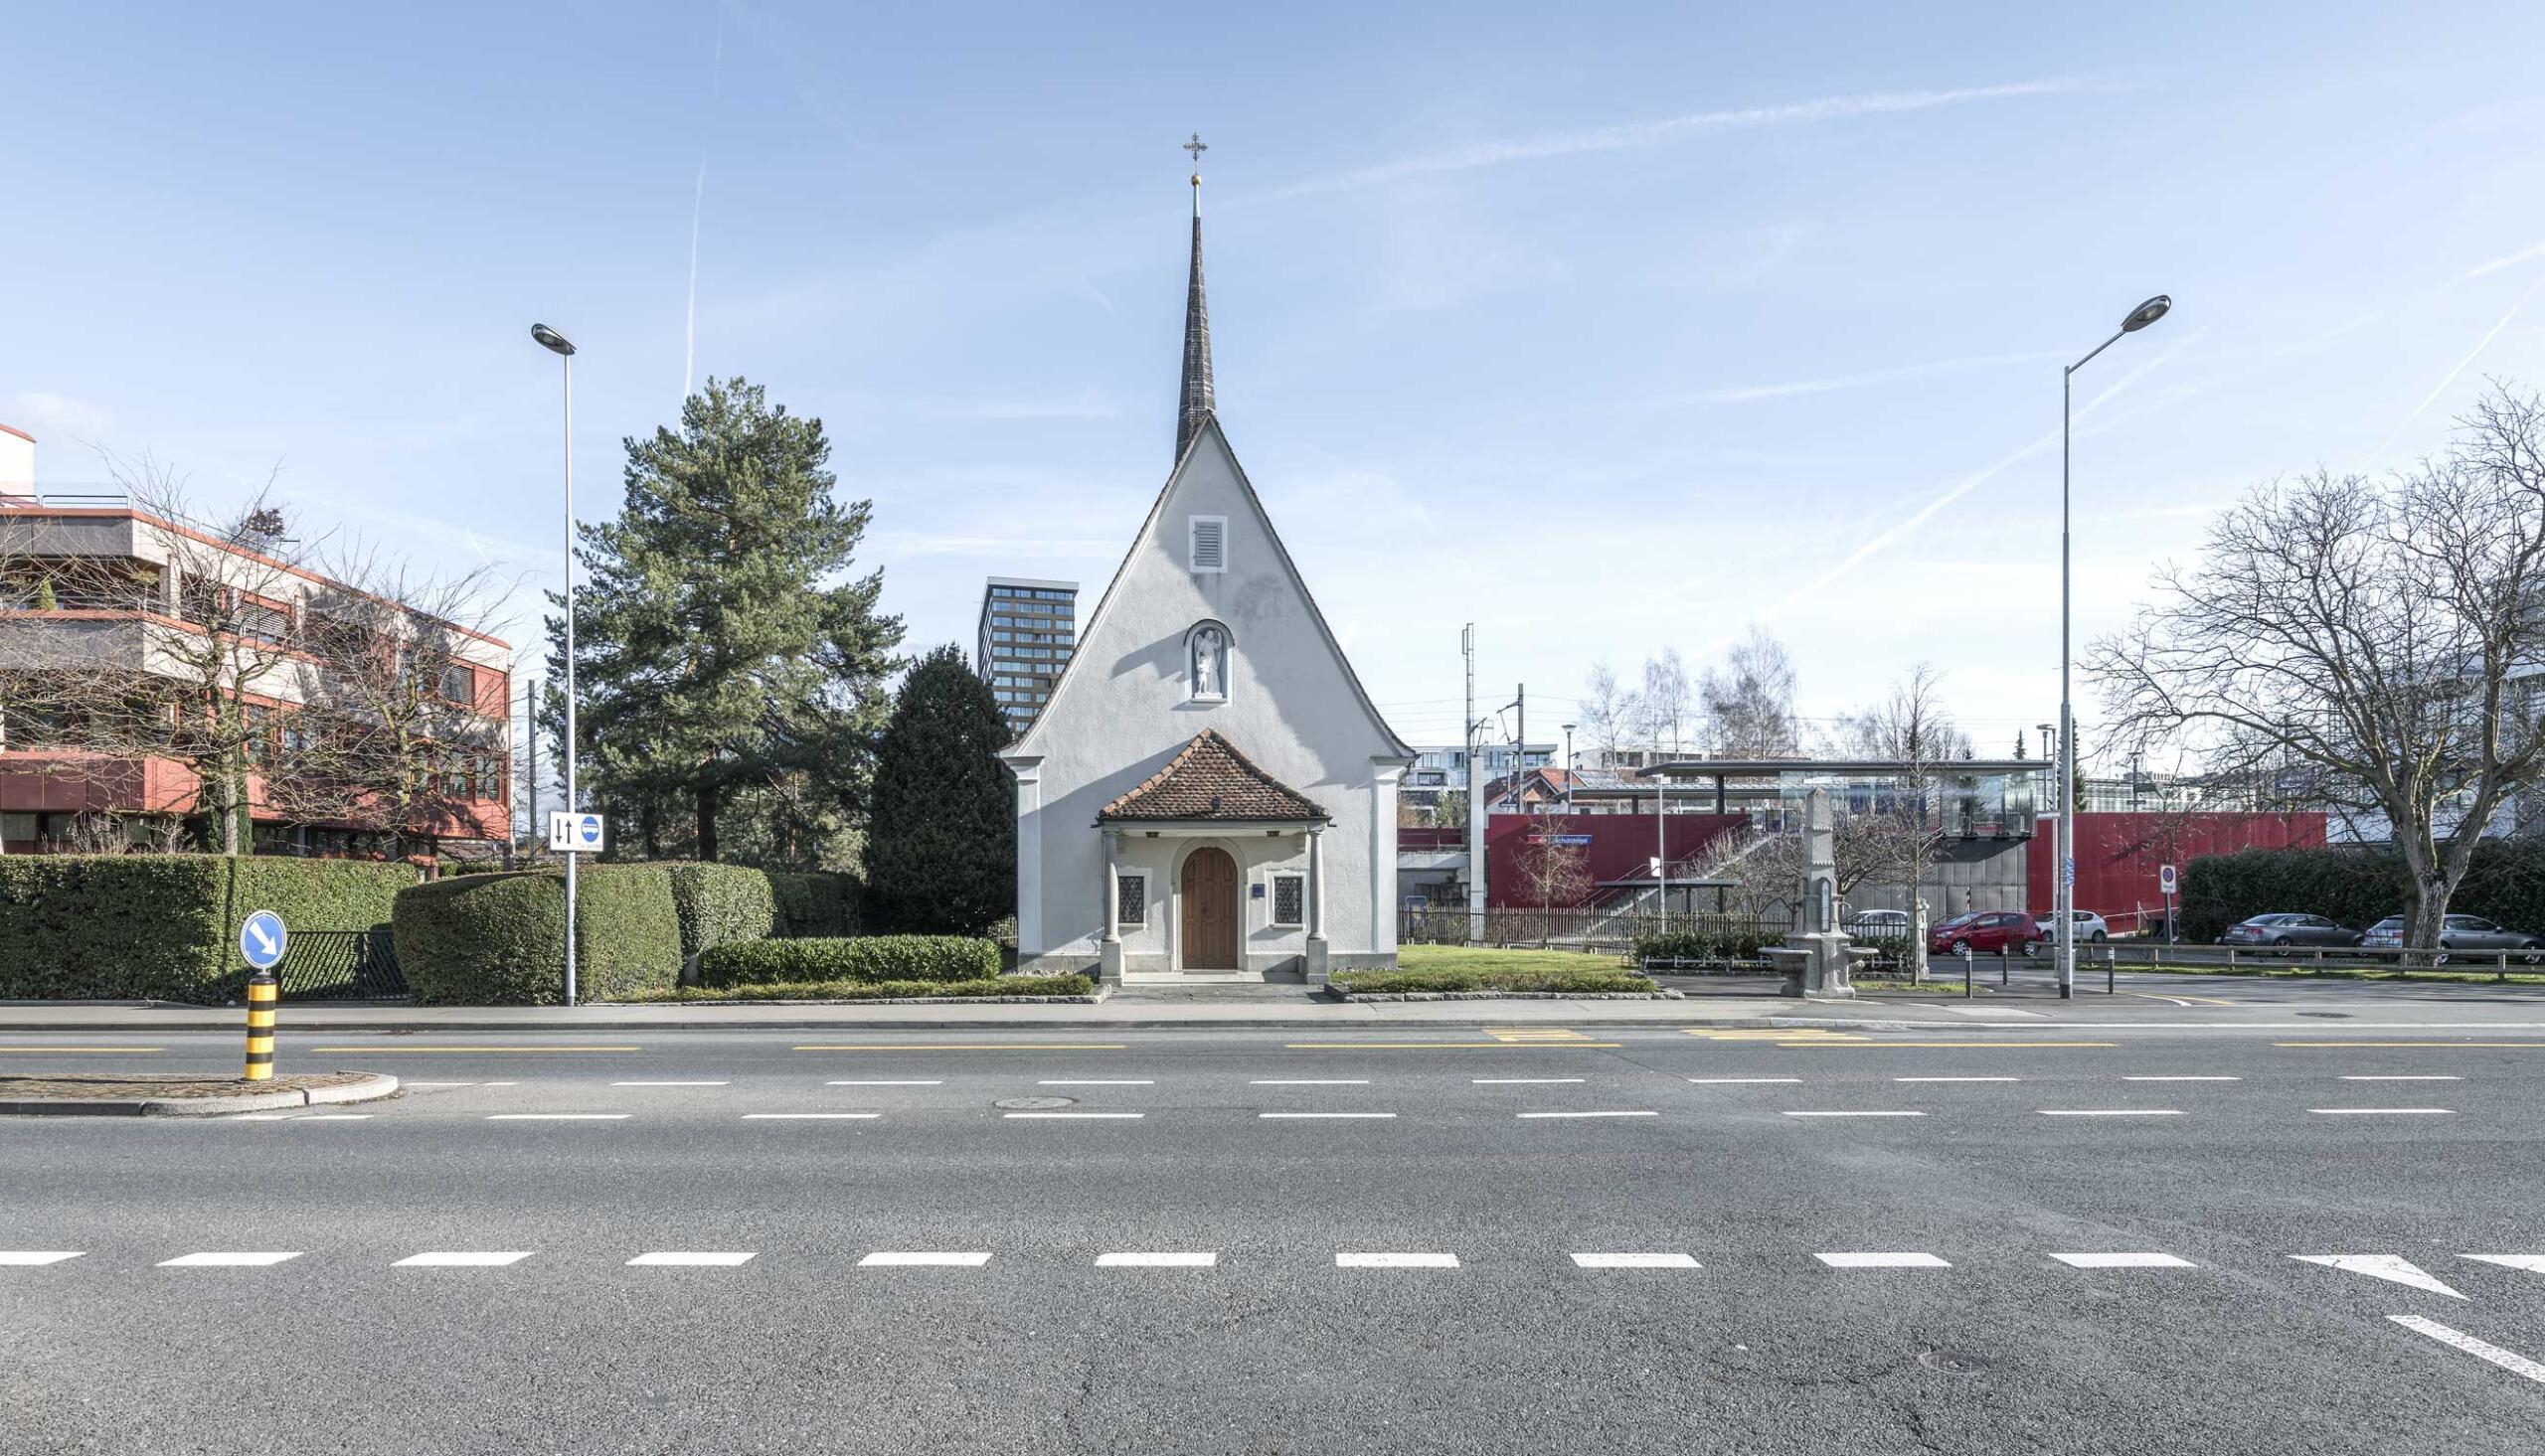 Schutzengel Kapelle in Zug Fotografie Regine Giesecke